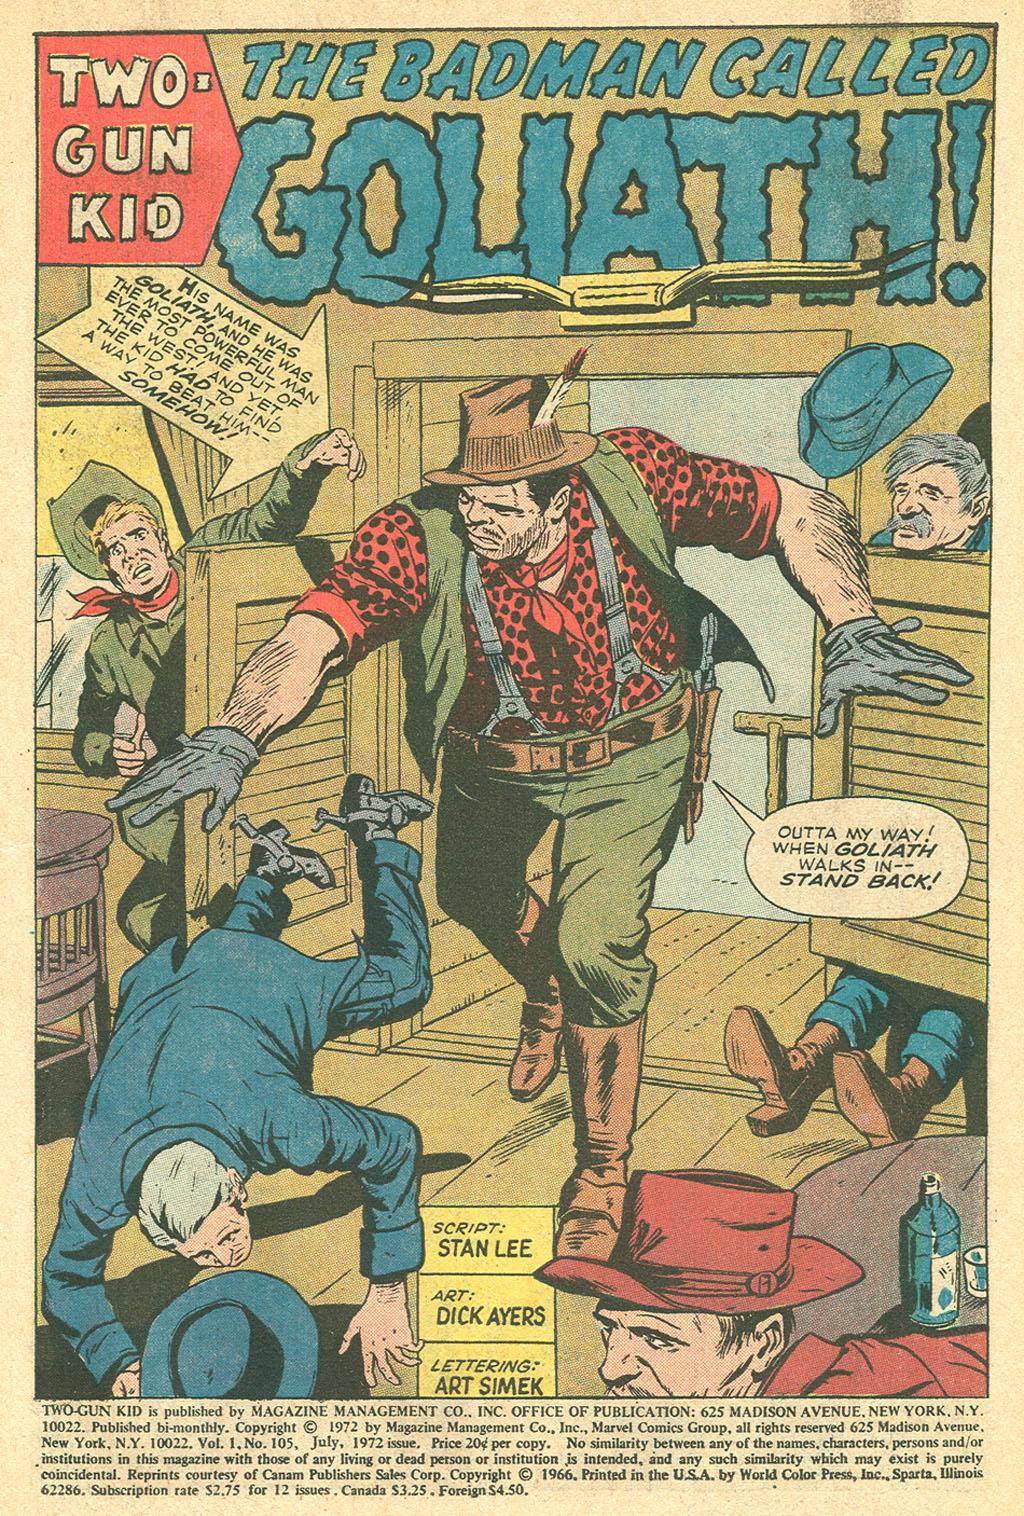 Read online Two-Gun Kid comic -  Issue #105 - 3